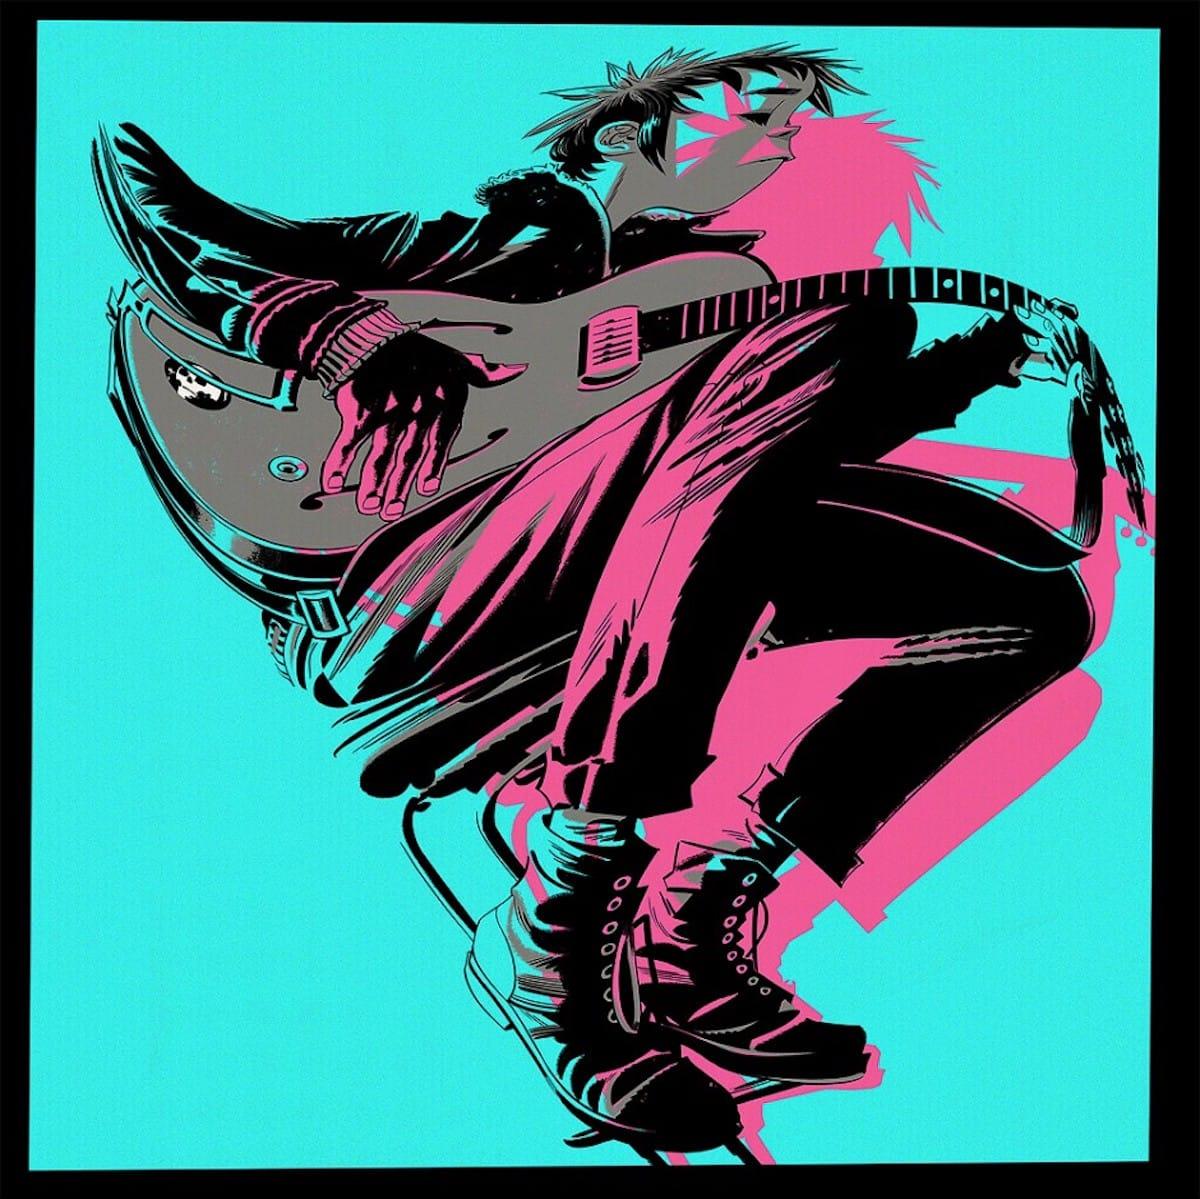 ゴリラズ追加公演発表!新作『The Now Now』全曲演奏公演が決定 music180601_gorillaz_1-1200x1199